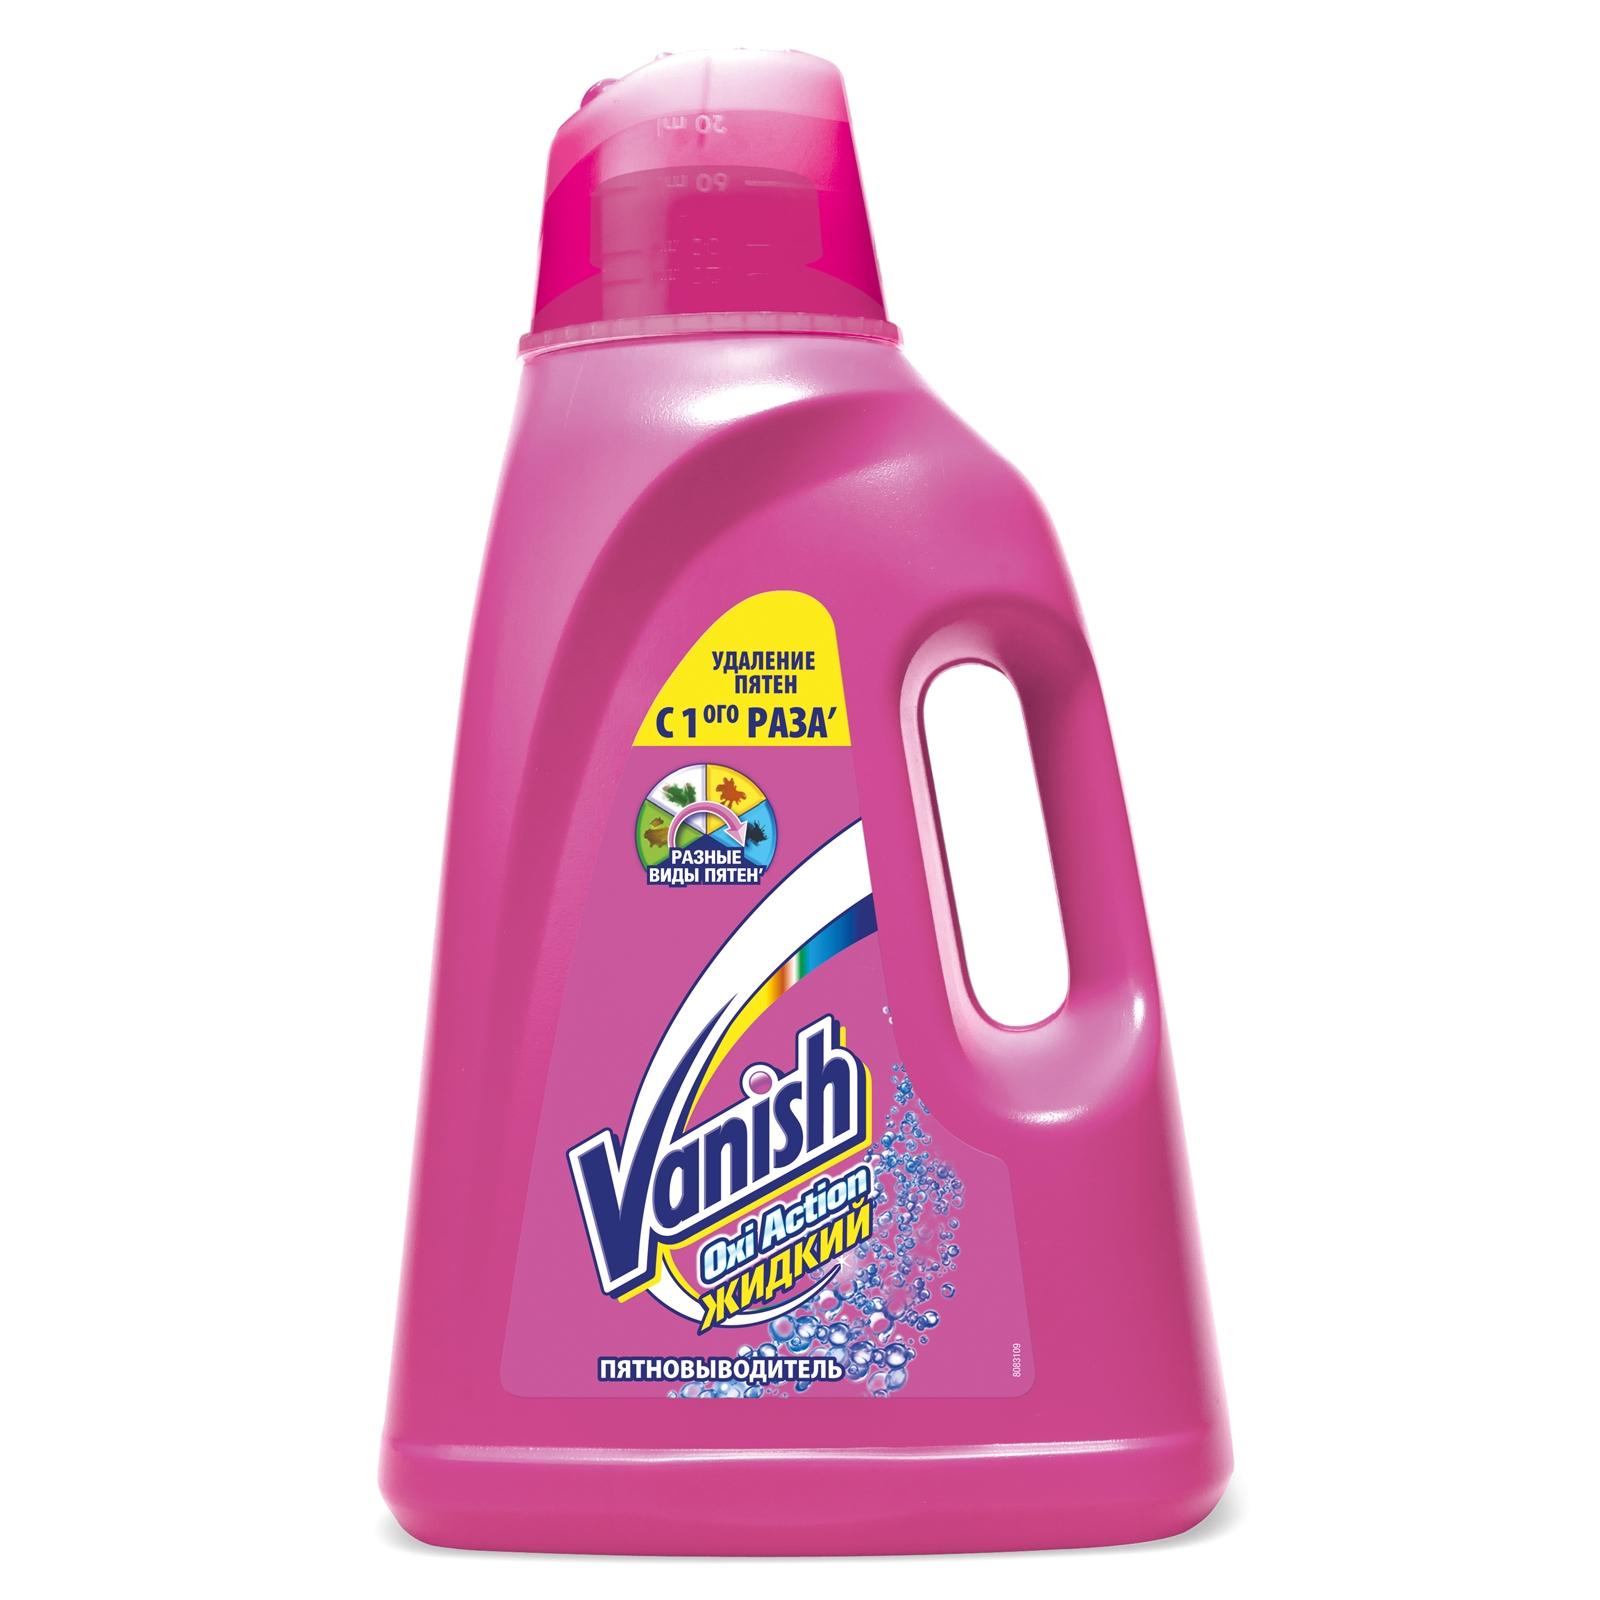 ��������������� Vanish Oxi Action 2 � ����������� ��� ������